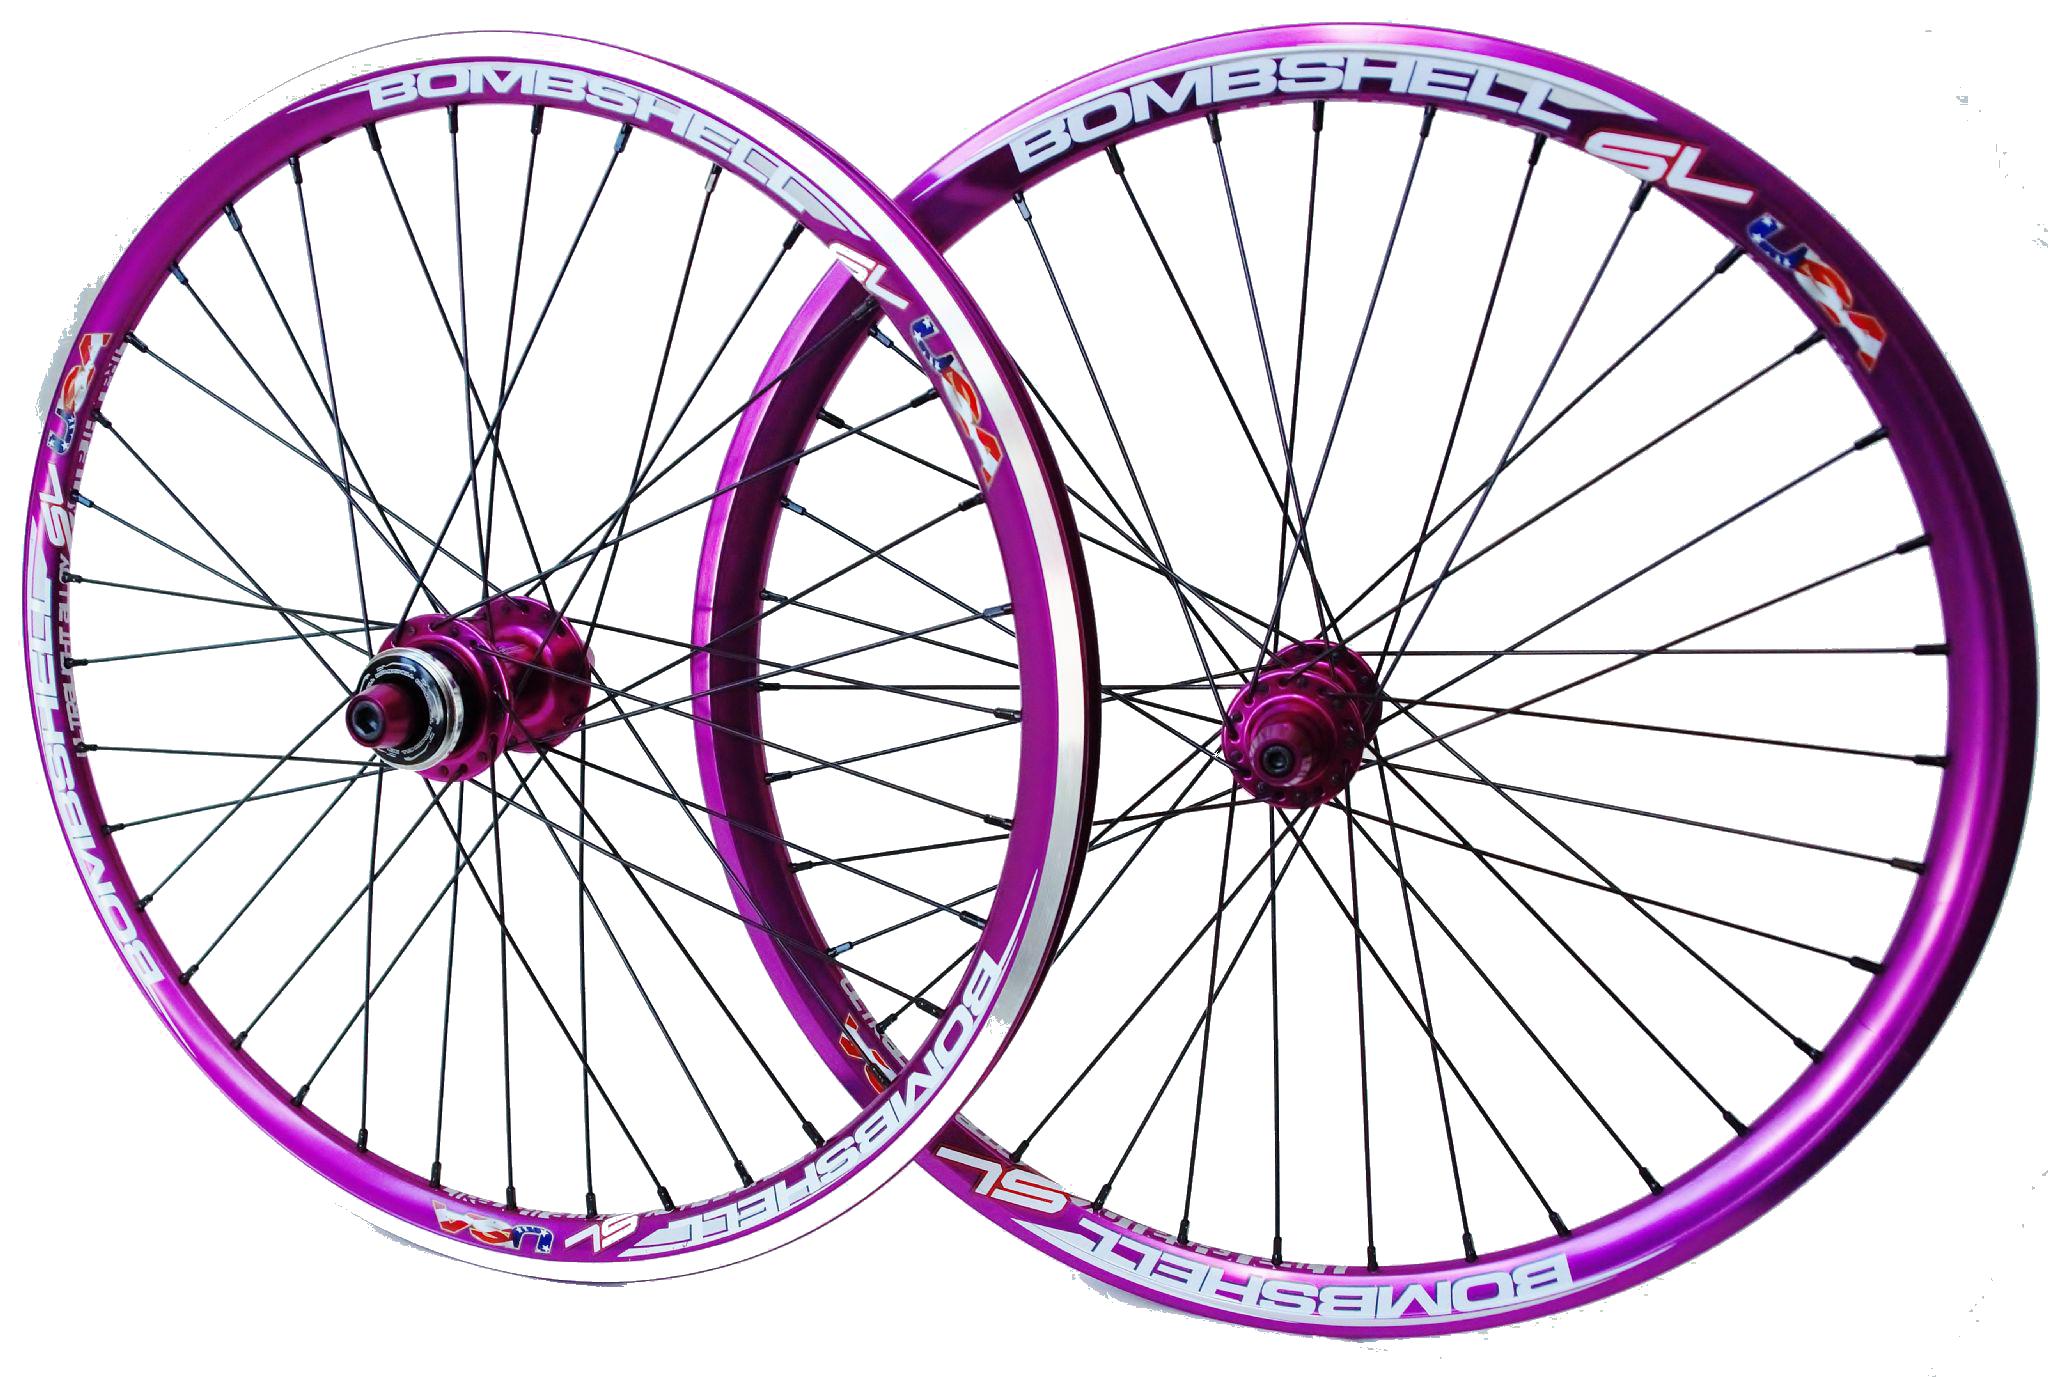 bombshell-slx-wheelset-52127-p